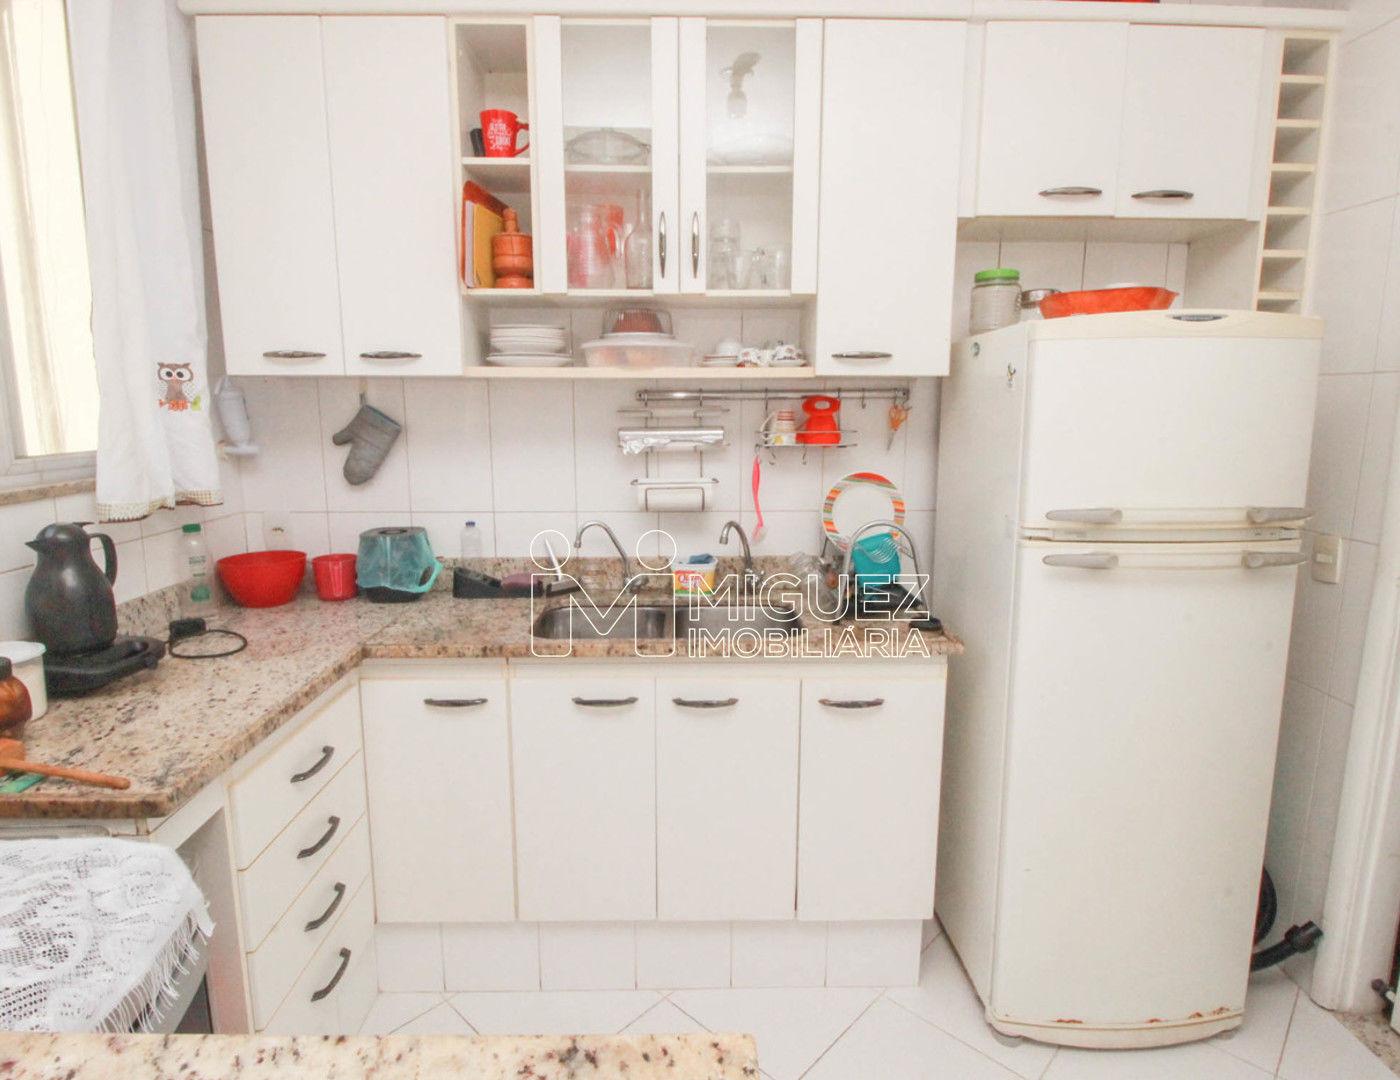 Apartamento, venda, Rua Marechal Marques Porto - Tijuca , Rio de janeiro